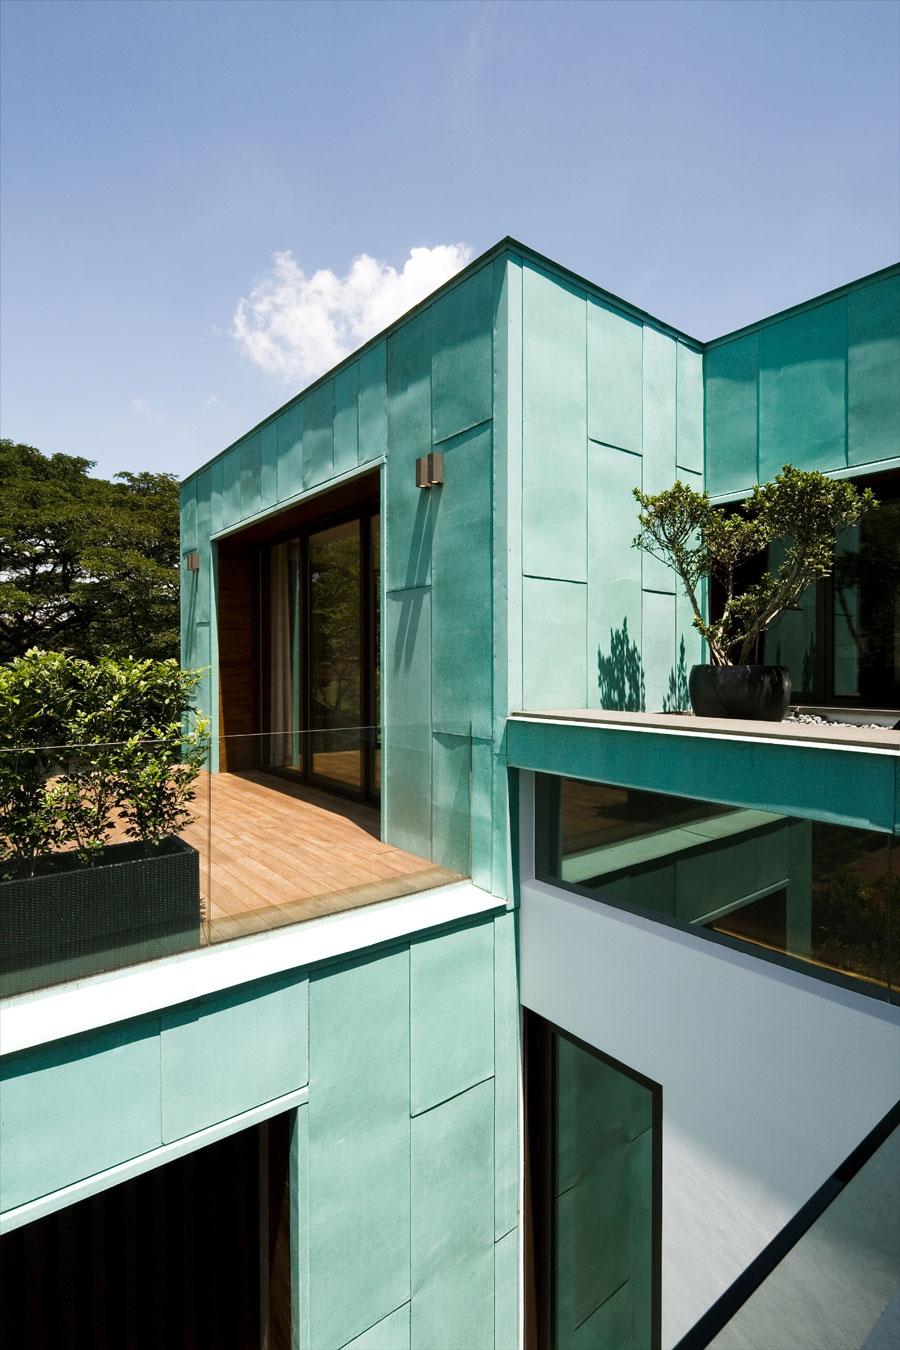 Top floor with patio space